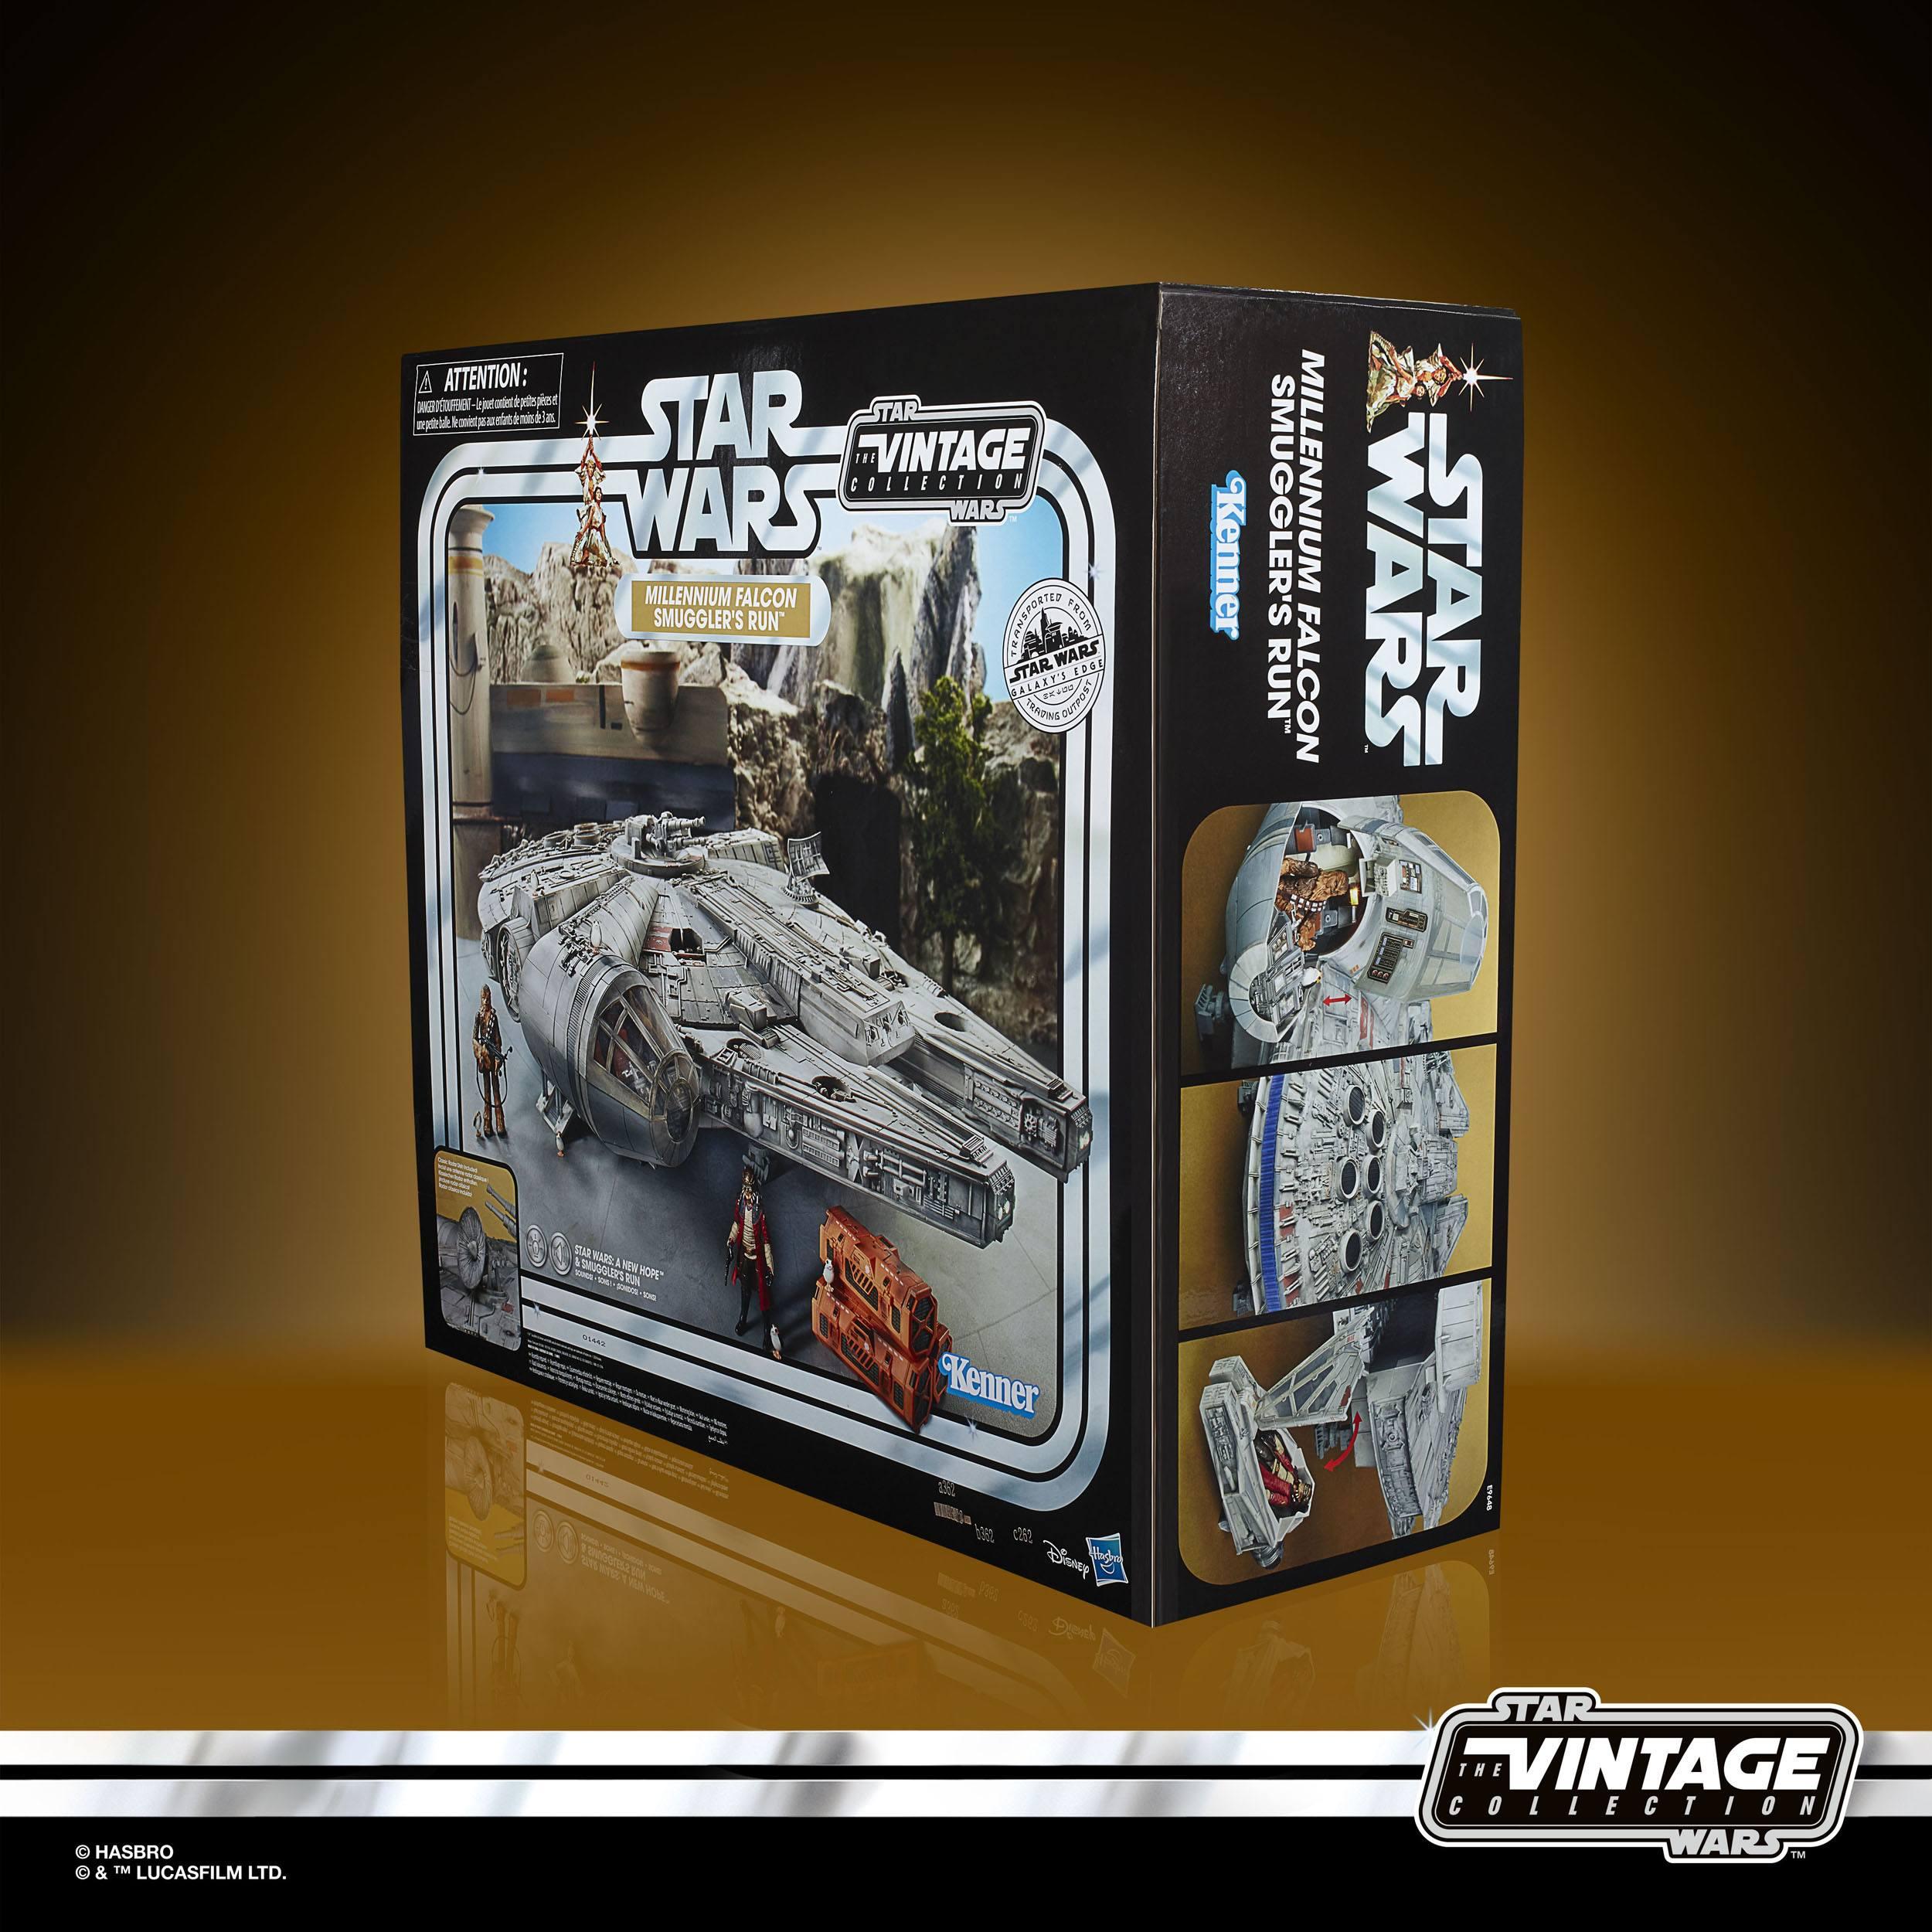 Star Wars Galaxy's Edge Vintage Collection Fahrzeug Millennium Falcon Smuggler´s Run HASE9648  05010993738625